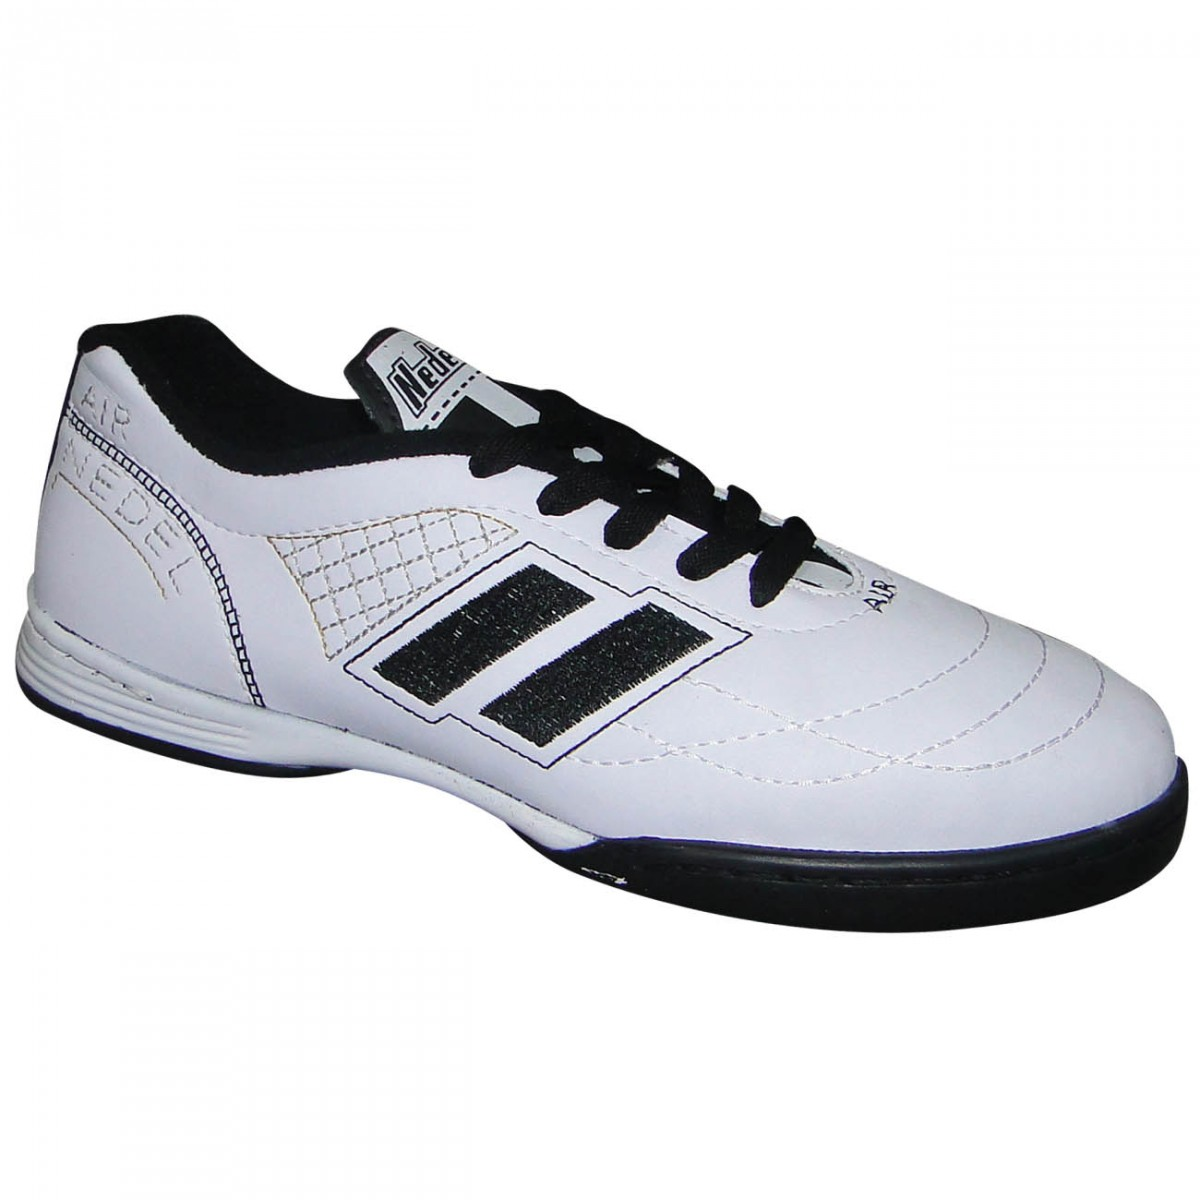 Tênis Nedel Ref.452 452 - Branco - Chuteira Nike 4a5d5a346704c